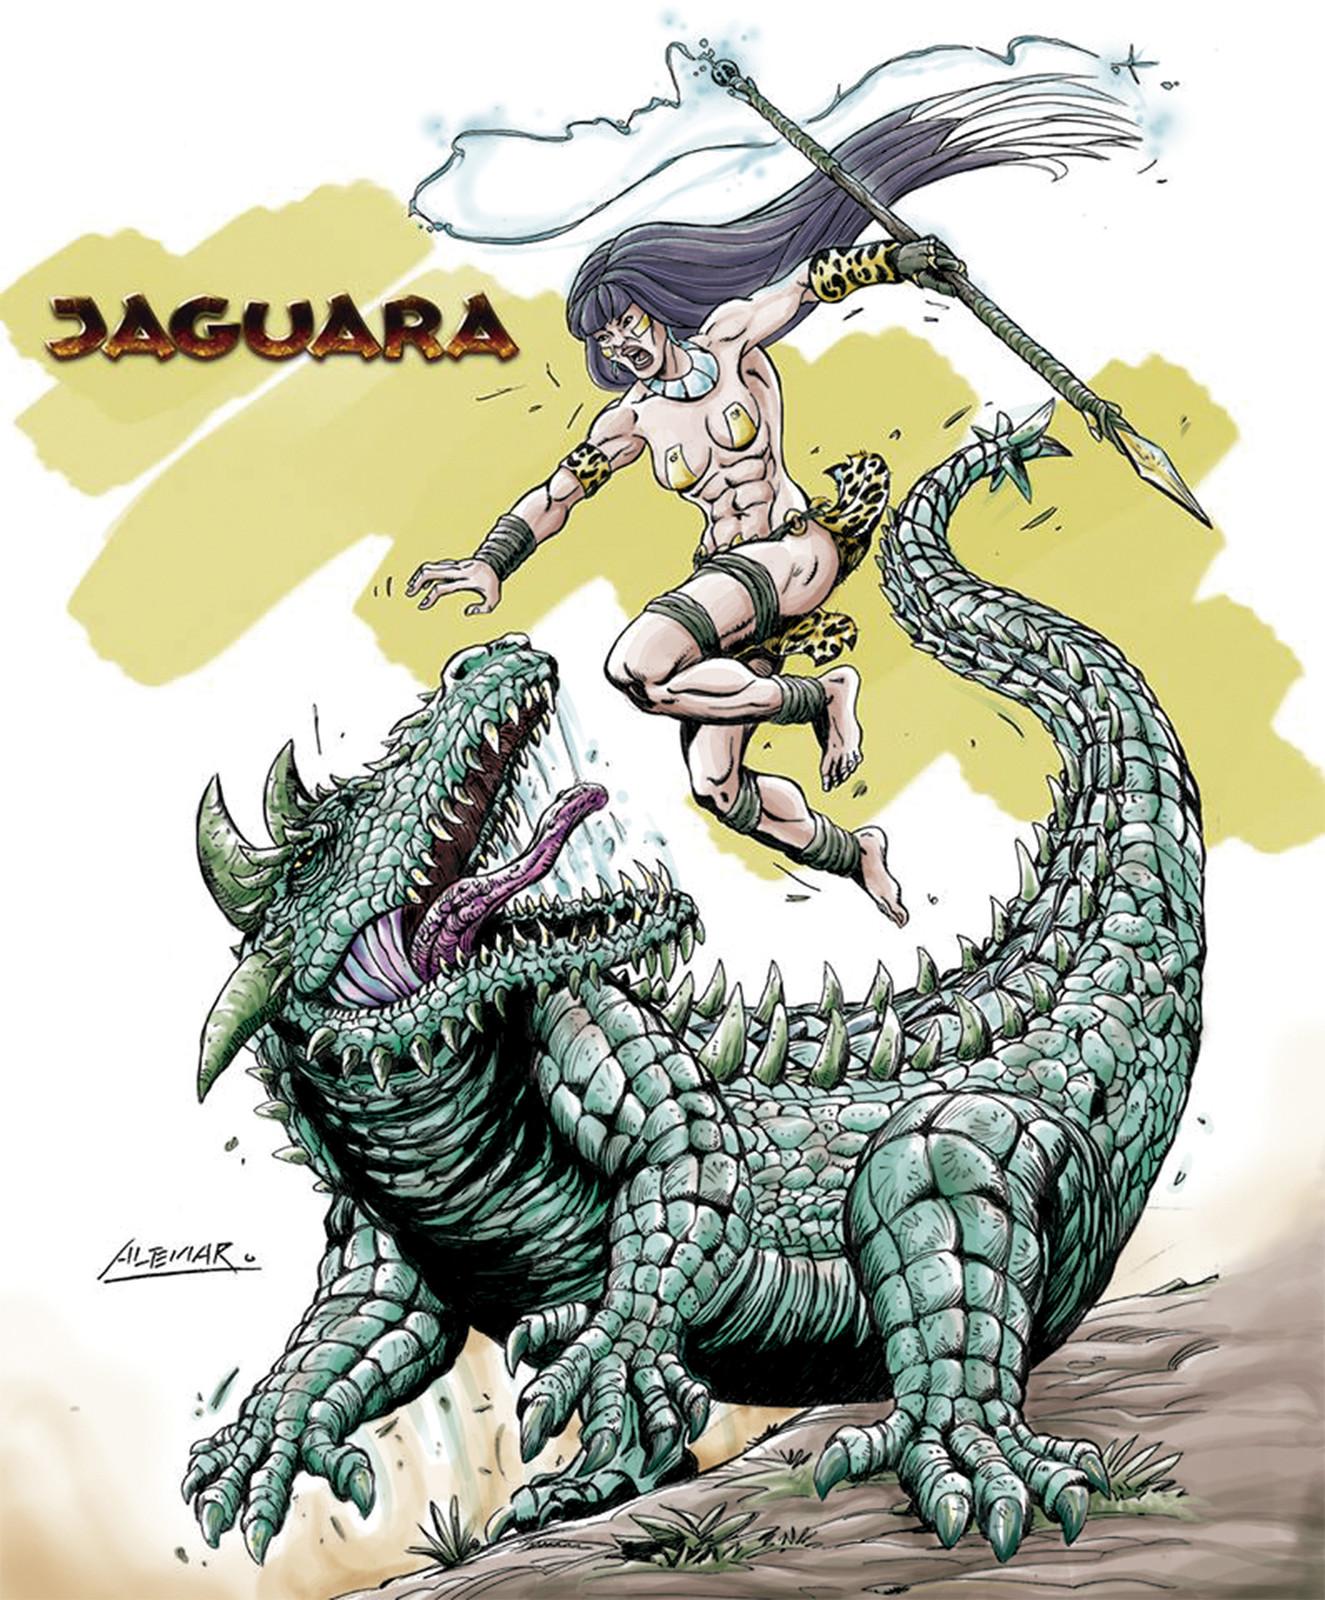 Kuc-A - This monstruous alligator is a dangerous enemy